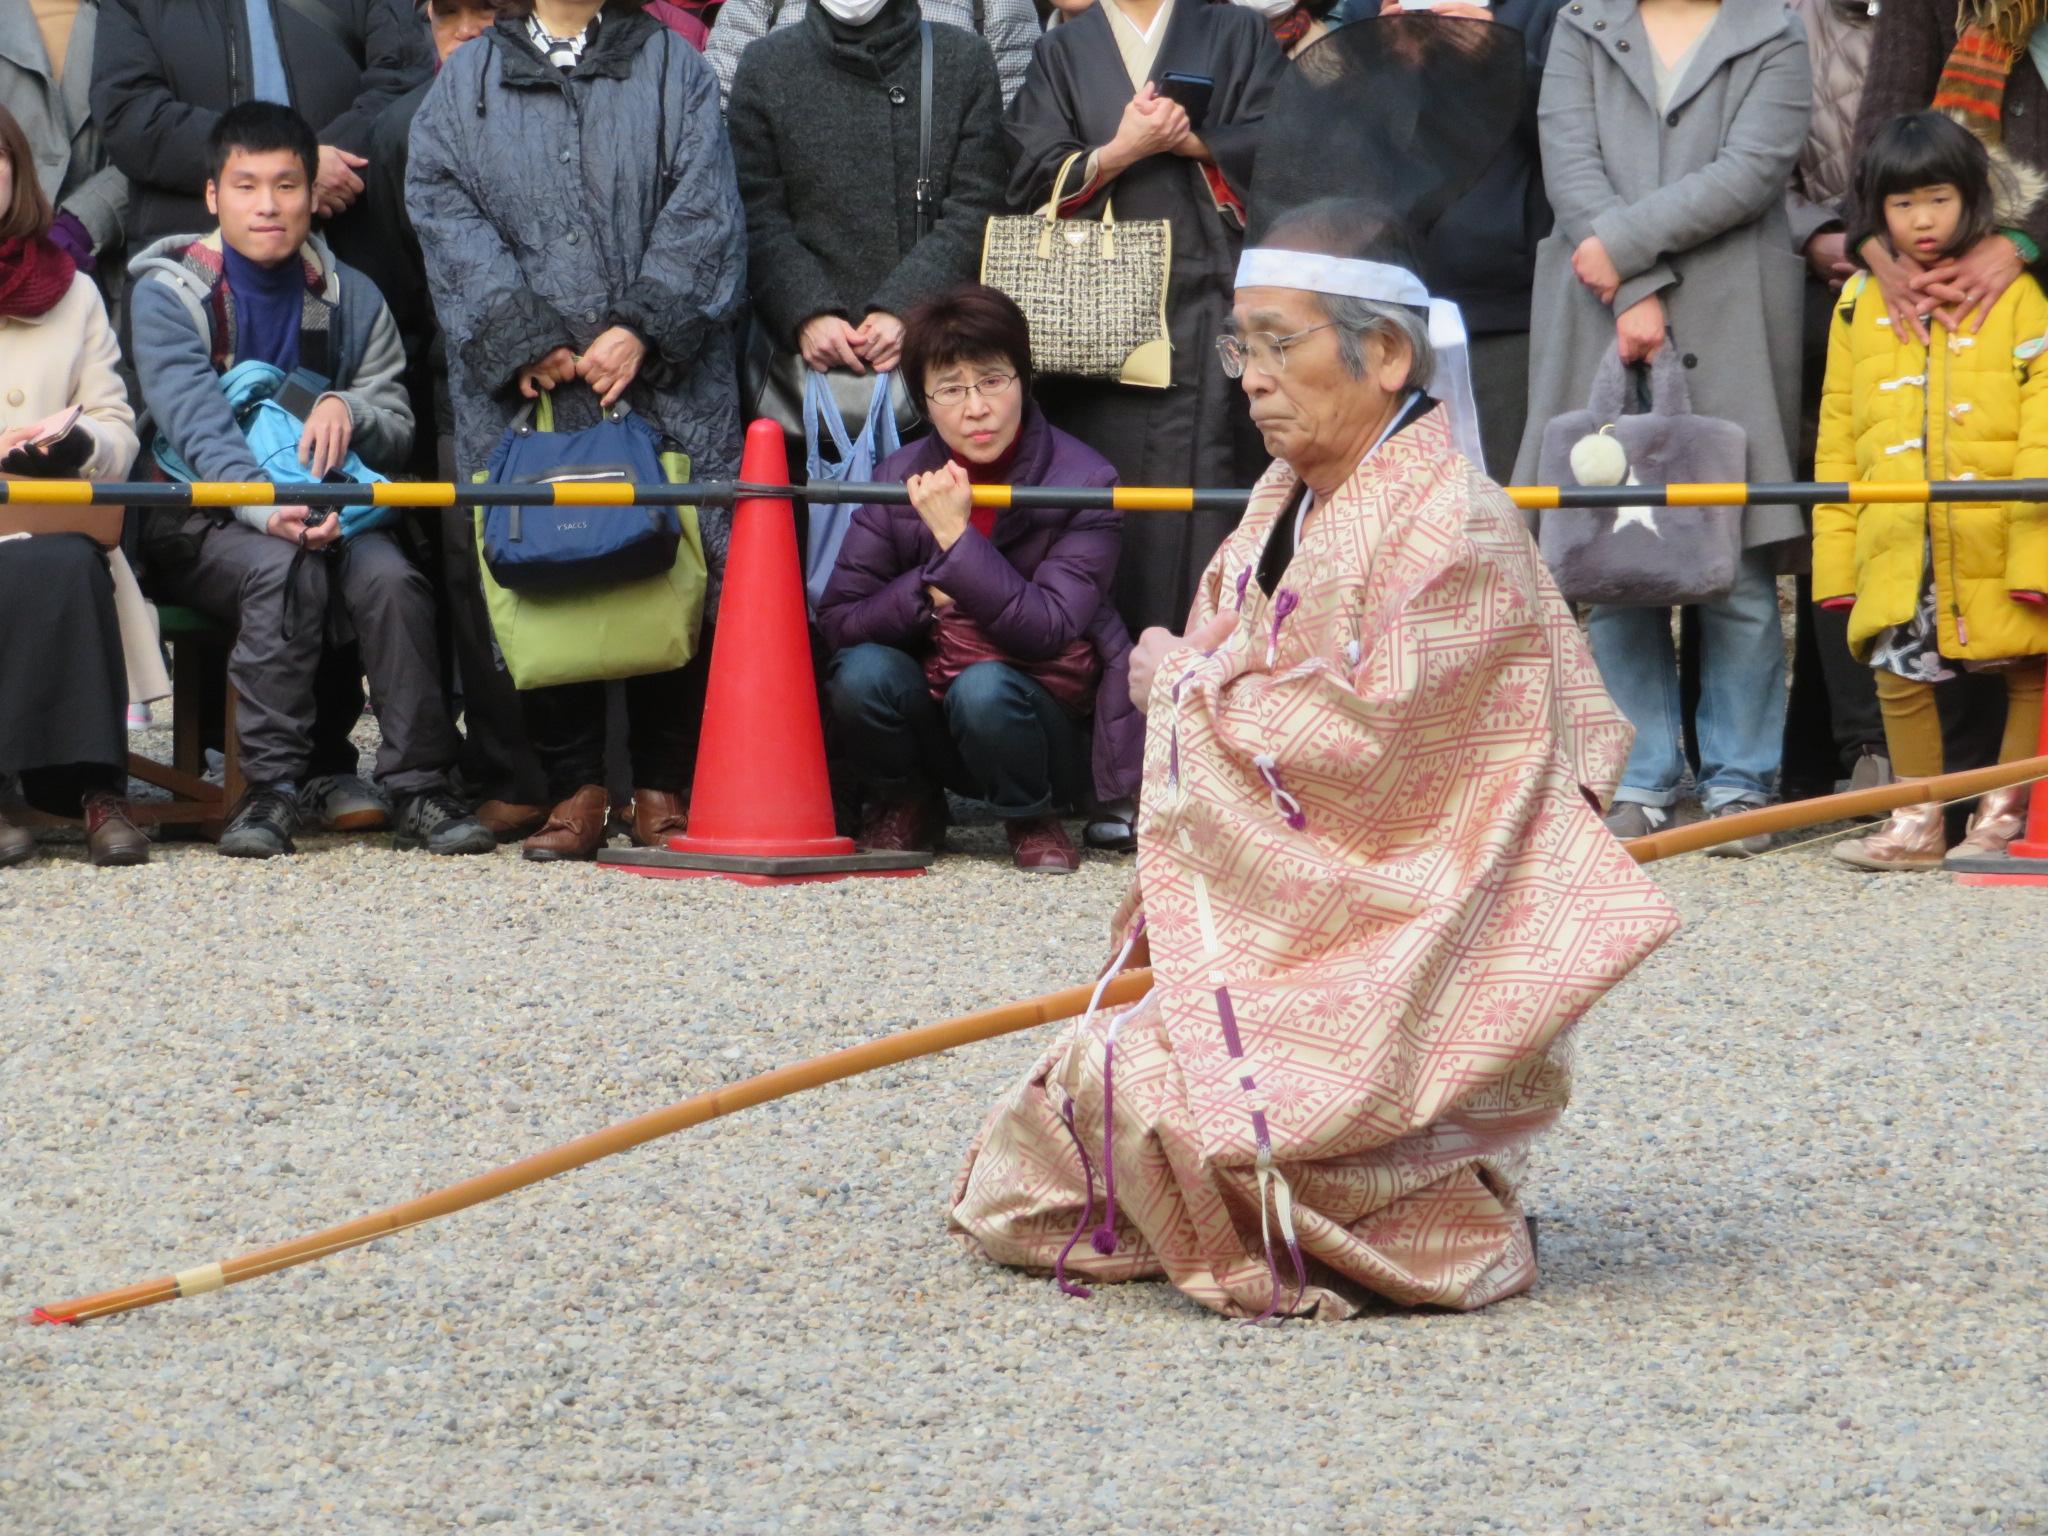 兵庫県弓道連盟の林会長